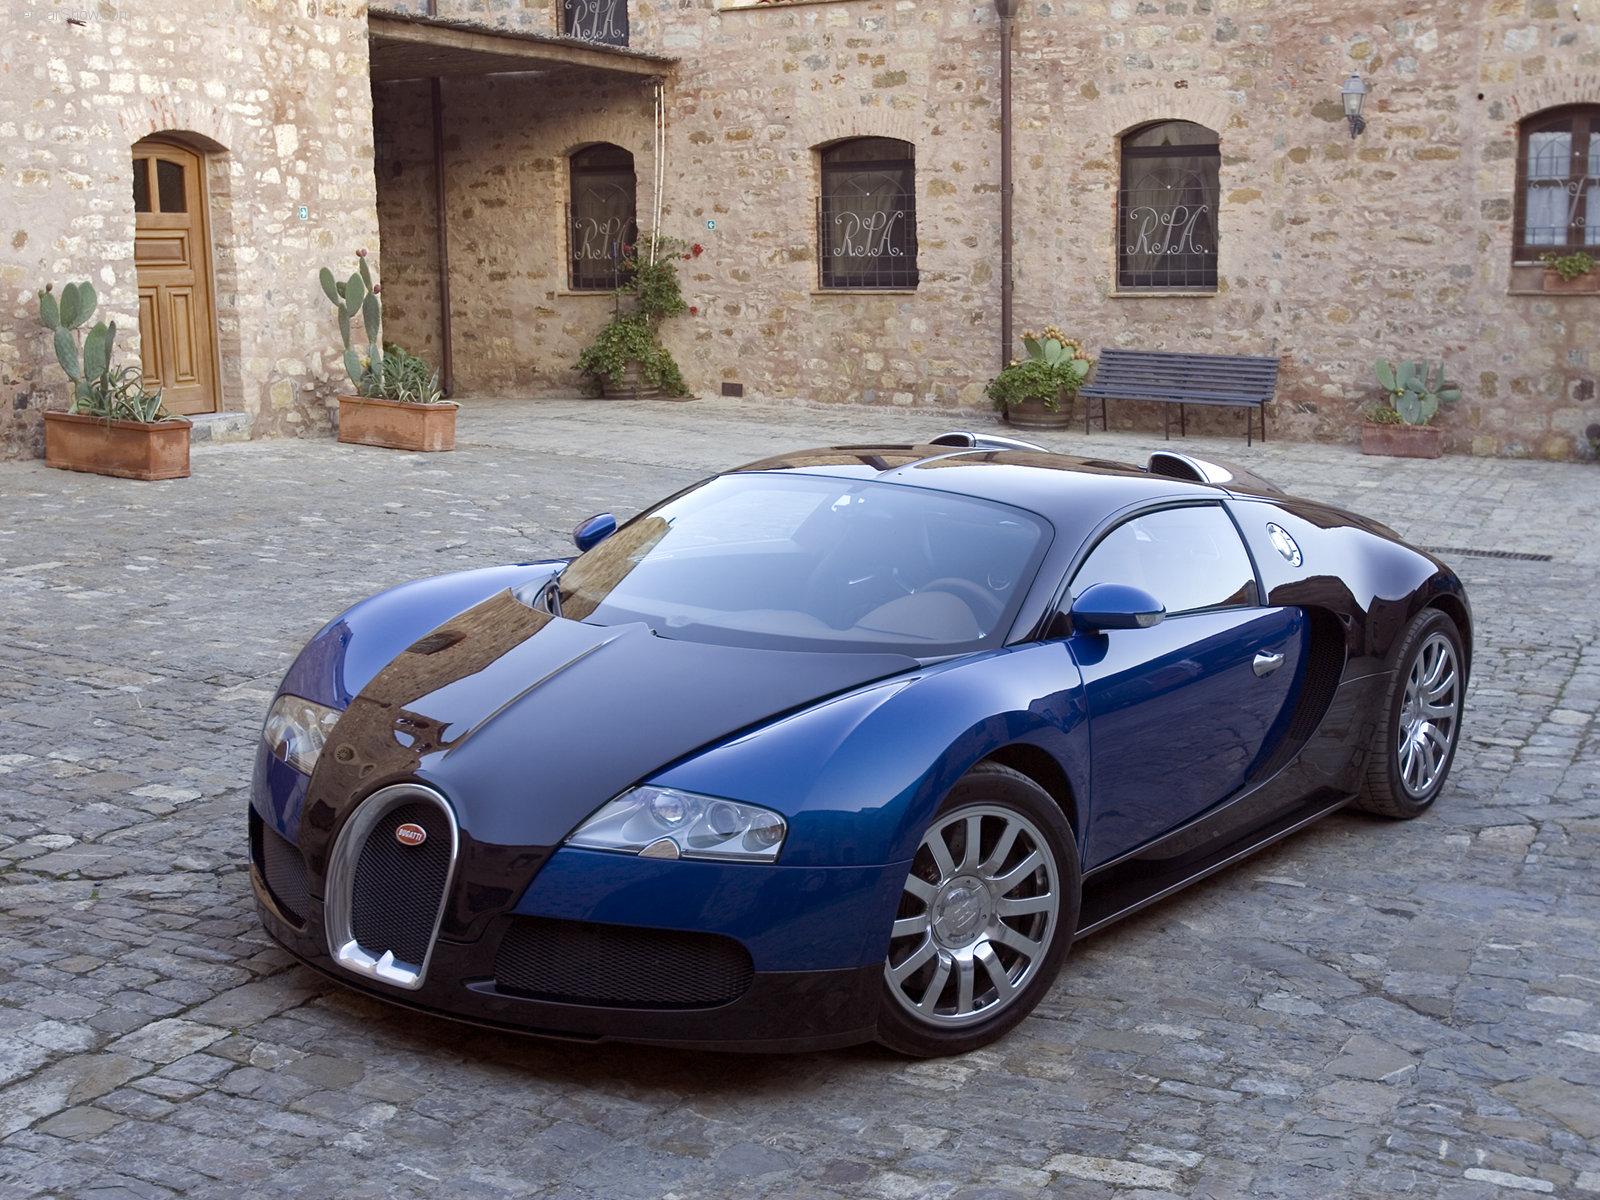 bugatti eb 16 4 veyron photos photogallery with 78 pics. Black Bedroom Furniture Sets. Home Design Ideas